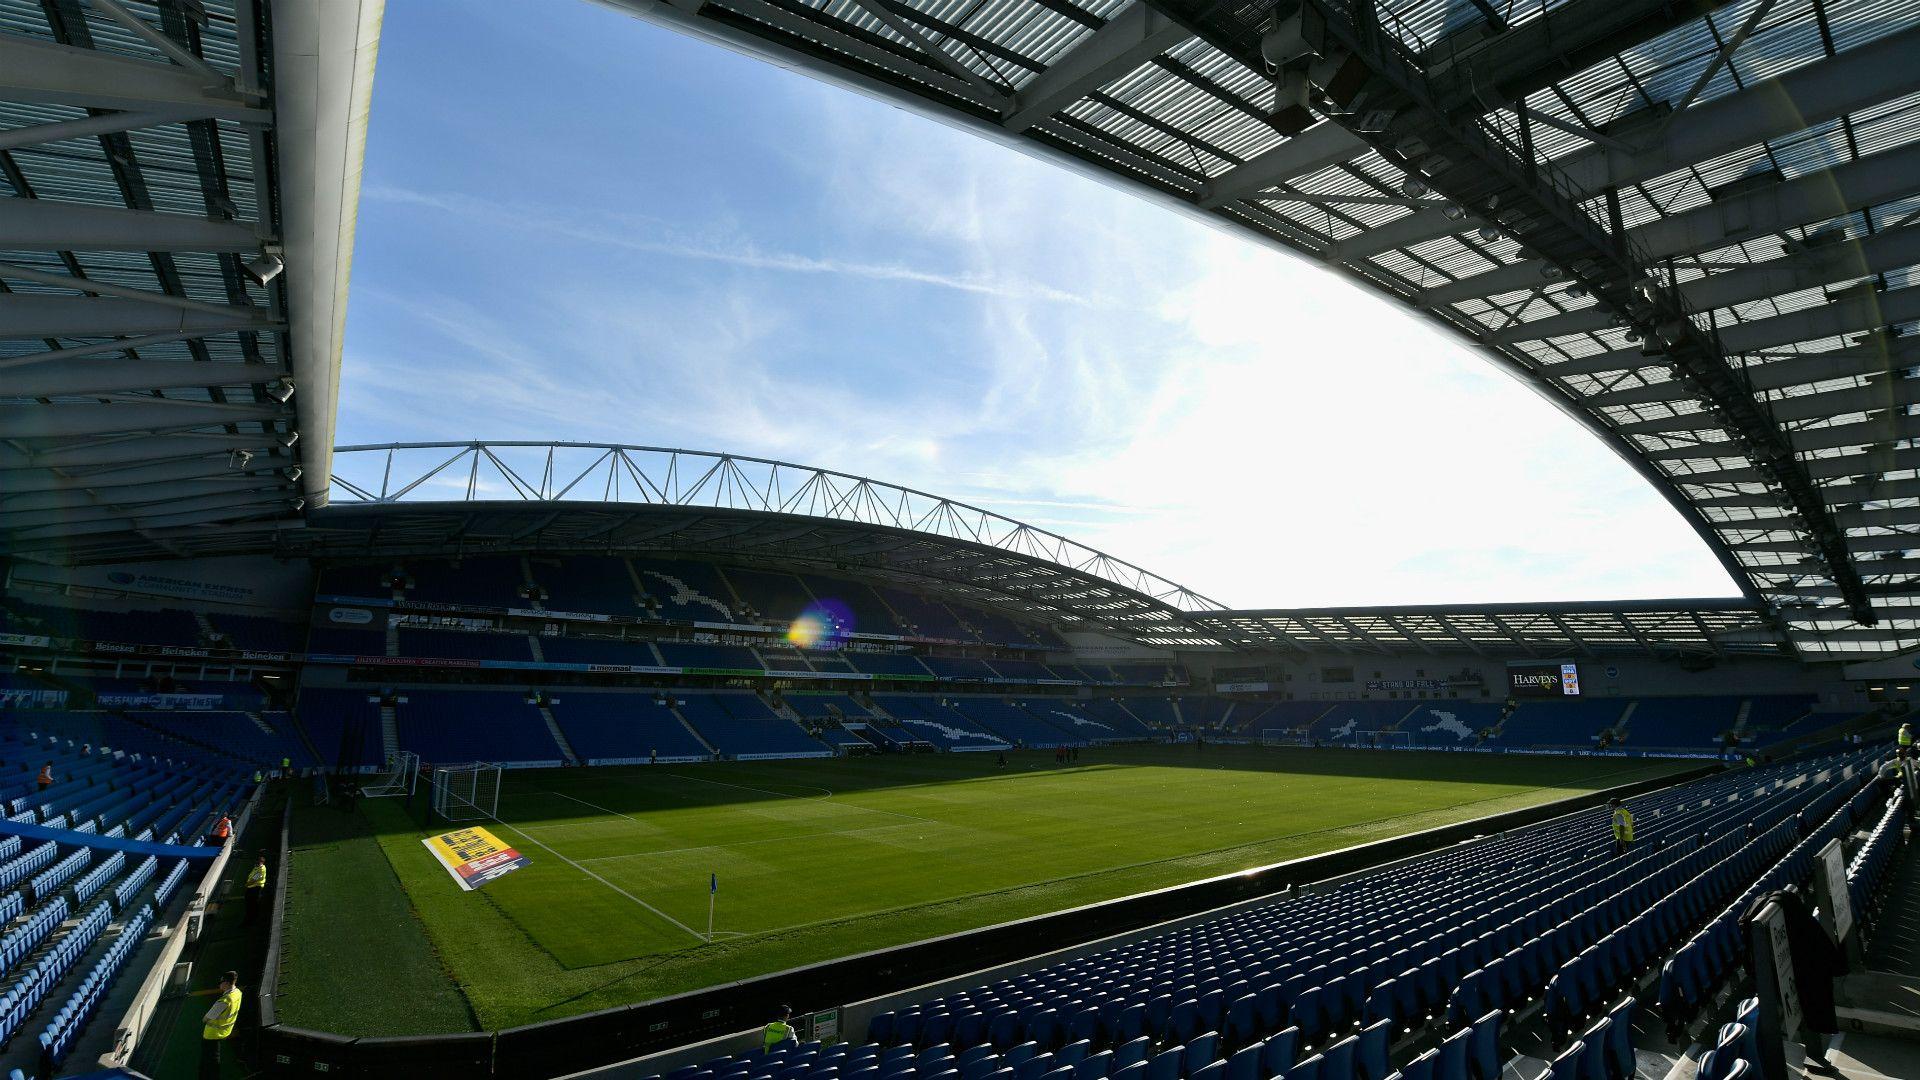 brighton-stadium_1c5cgyiasoqn01km5hz3zsdn1y